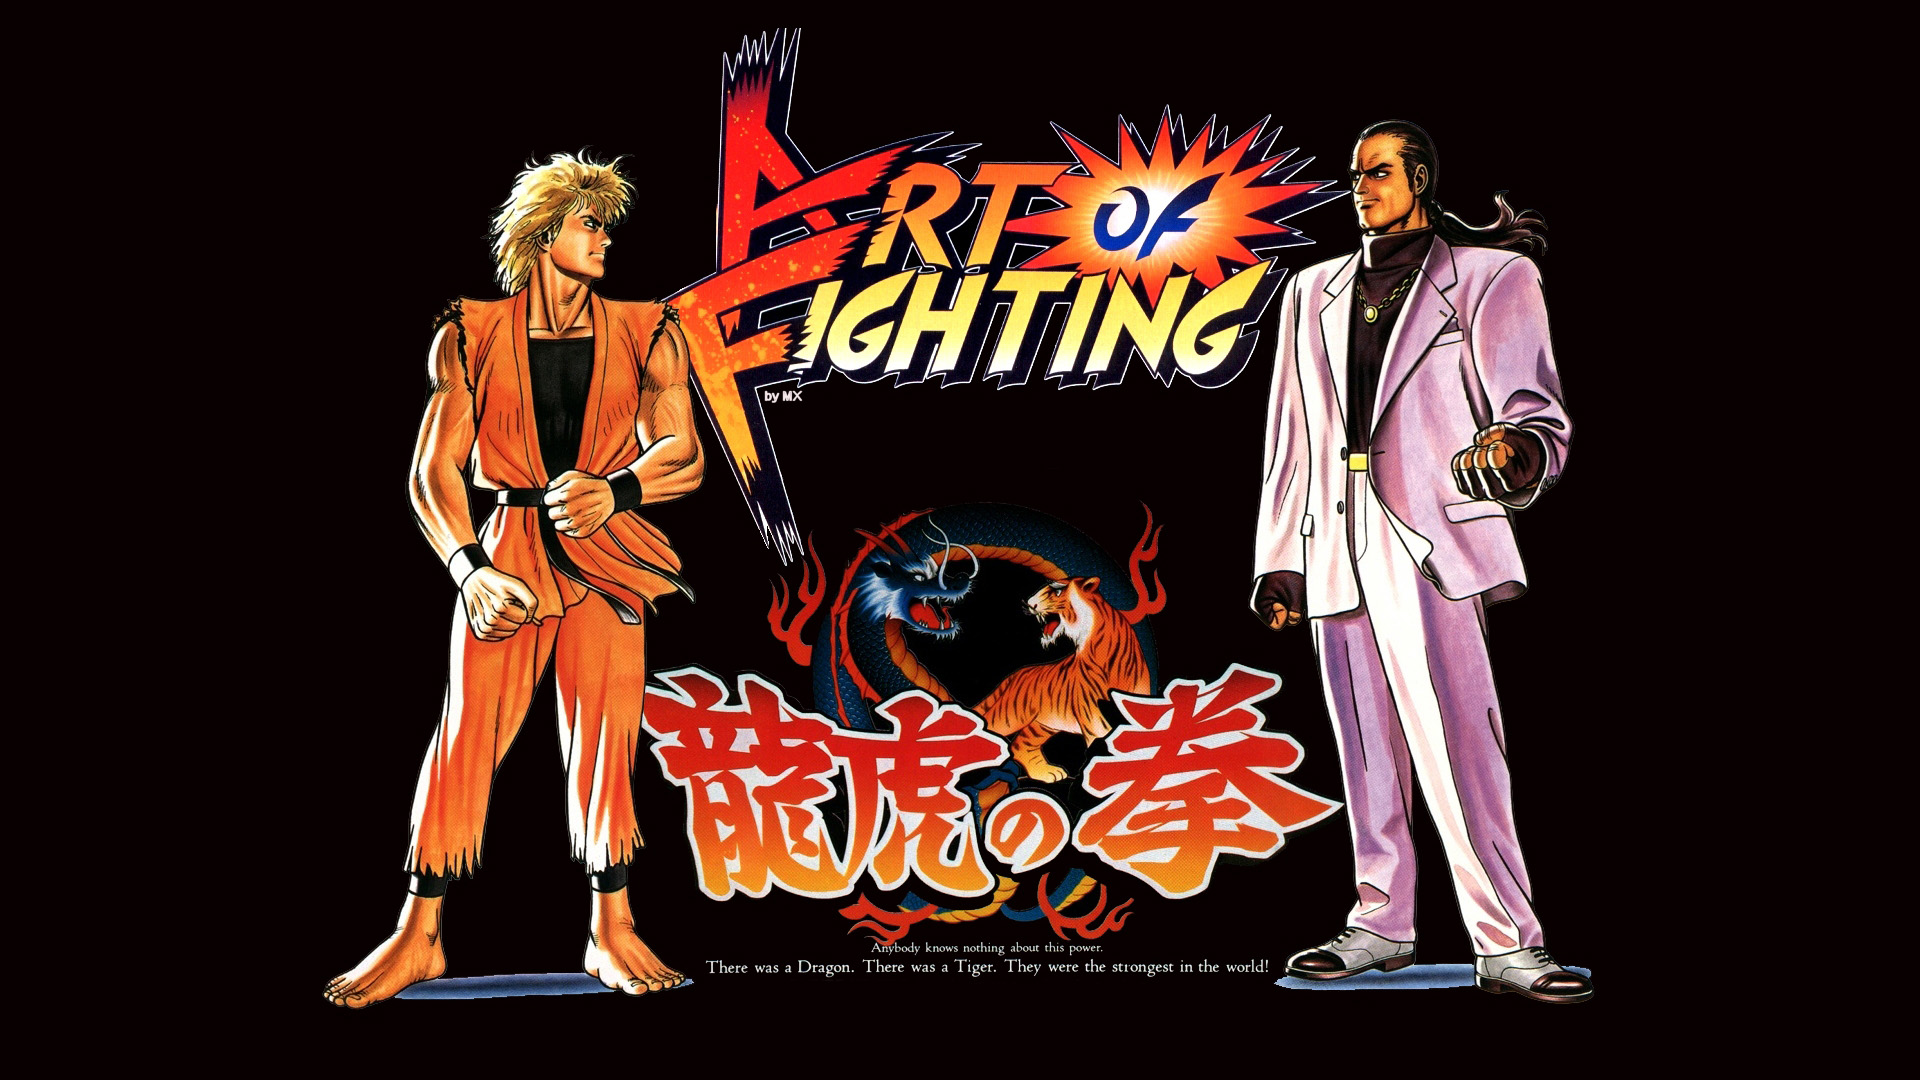 art of fighting 2 wallpaper